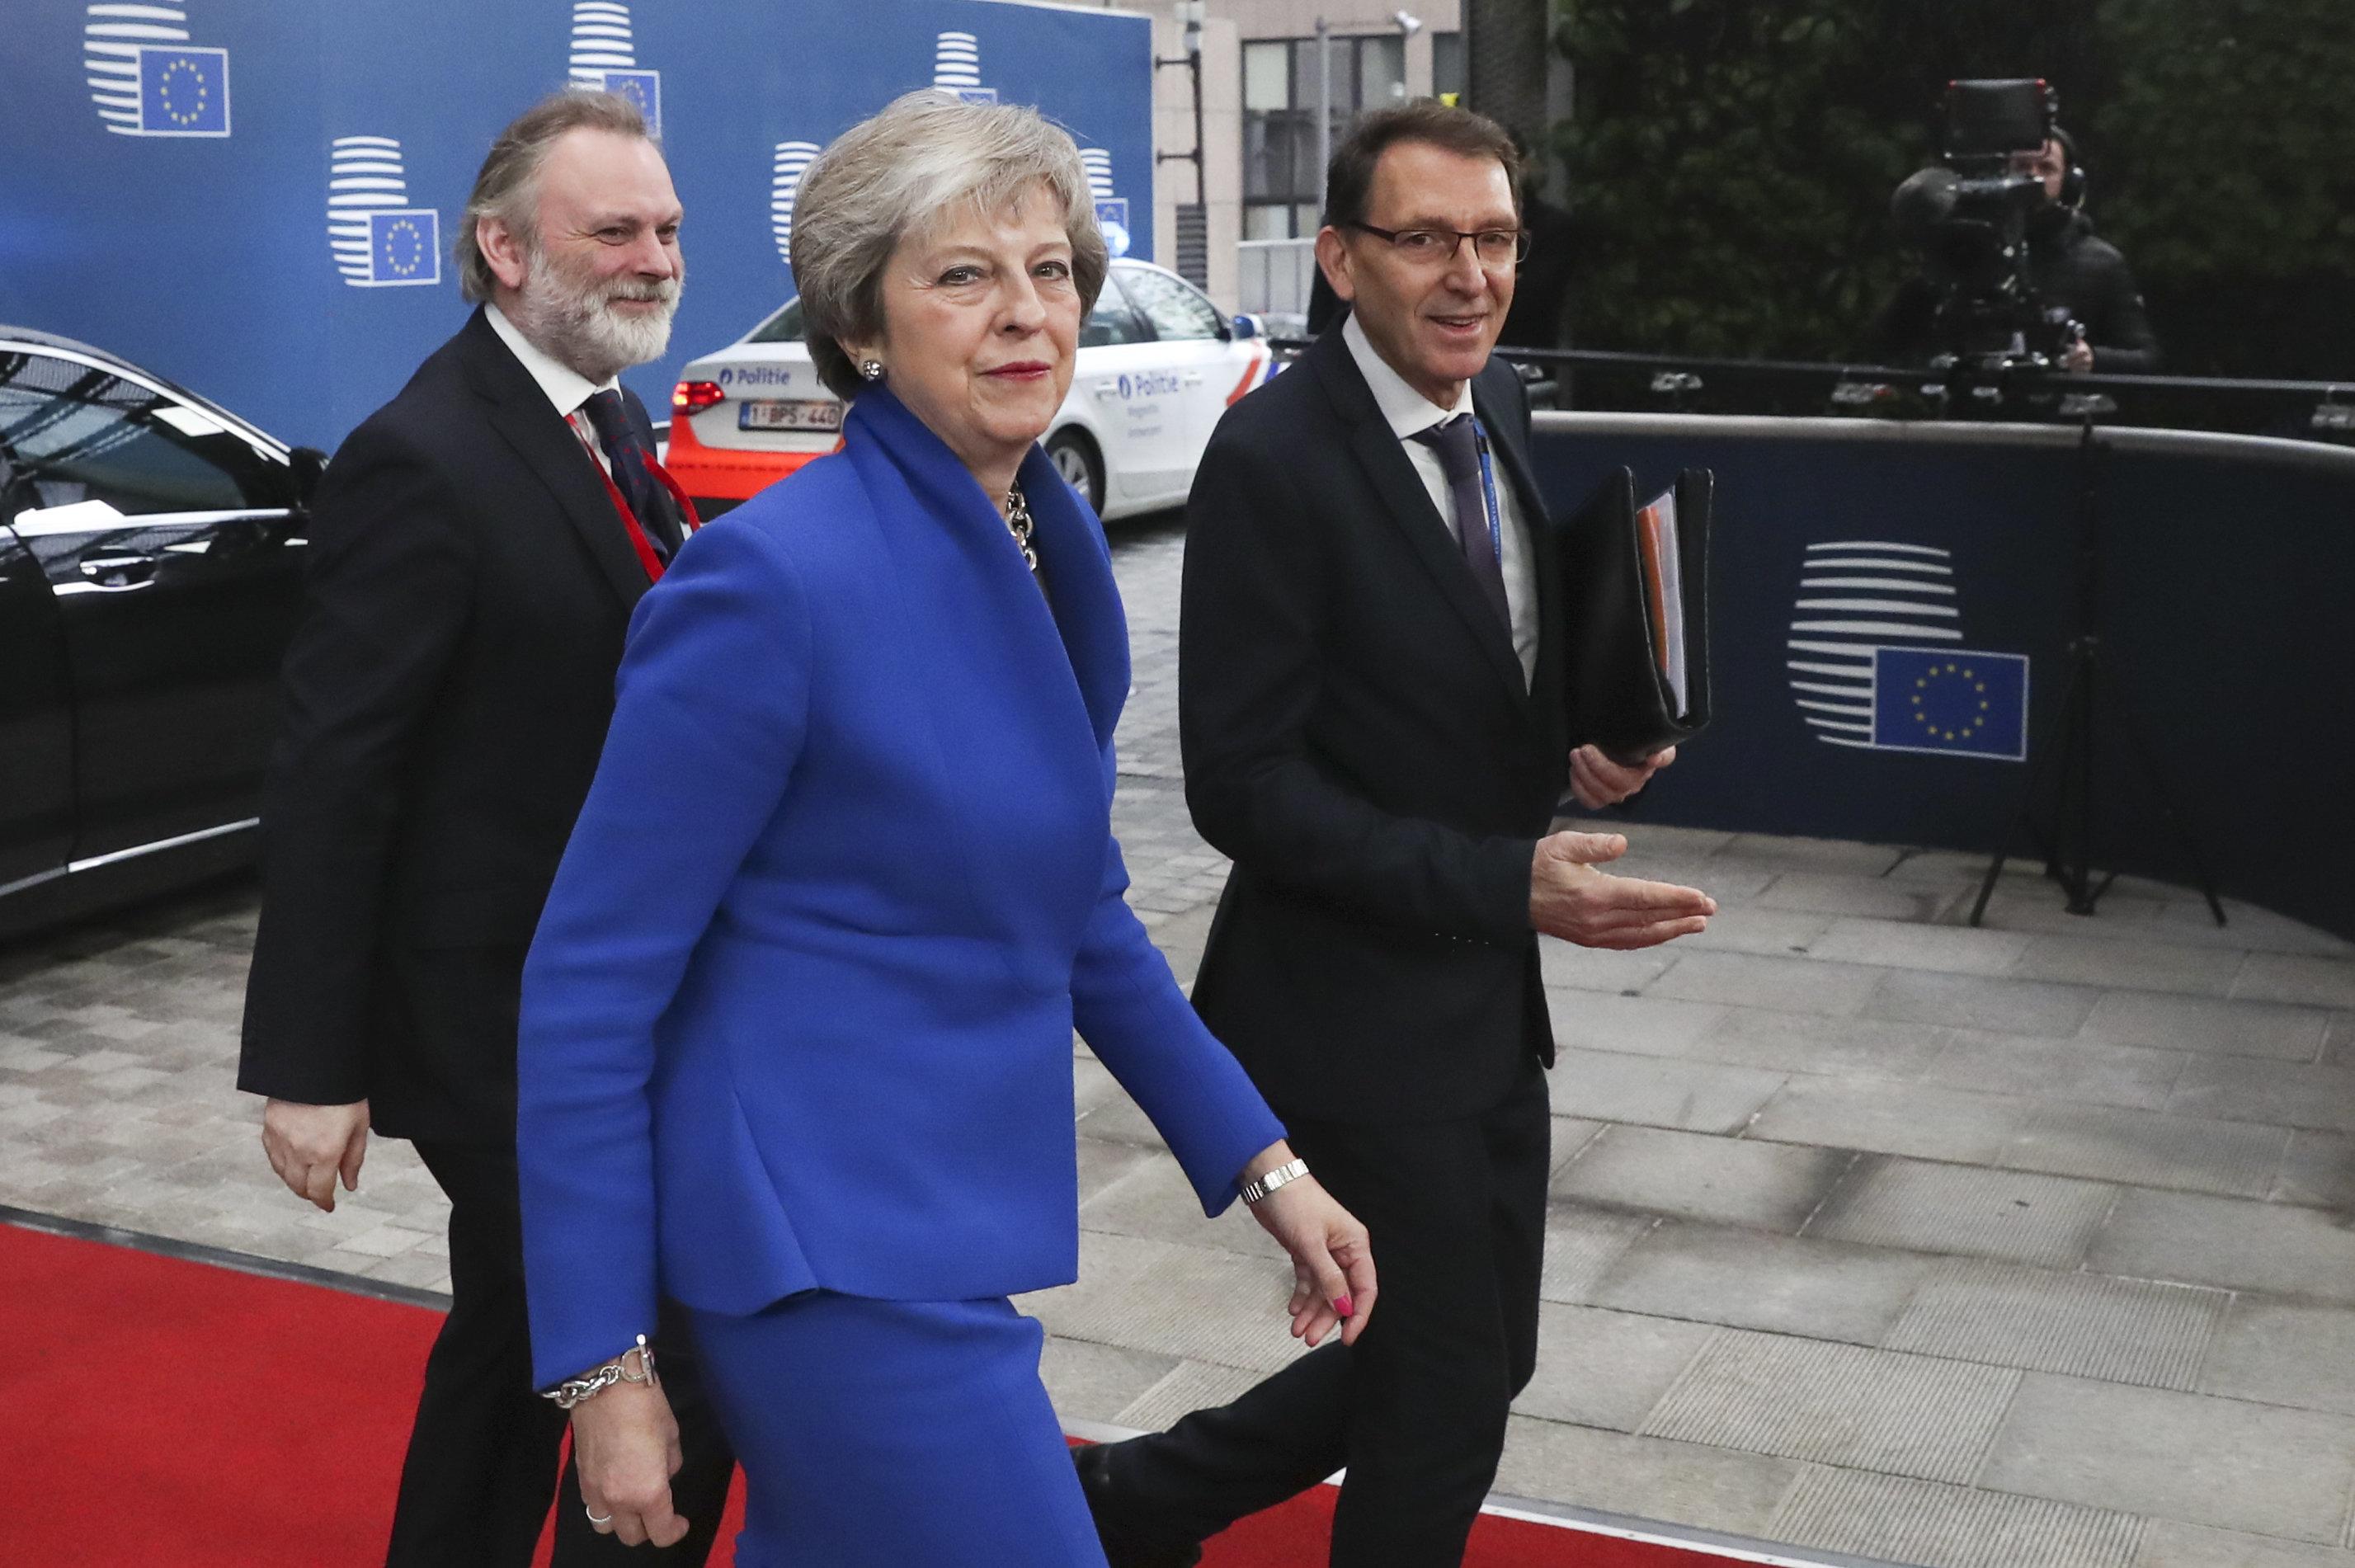 EU 지도자들이 '브렉시트 합의문'에